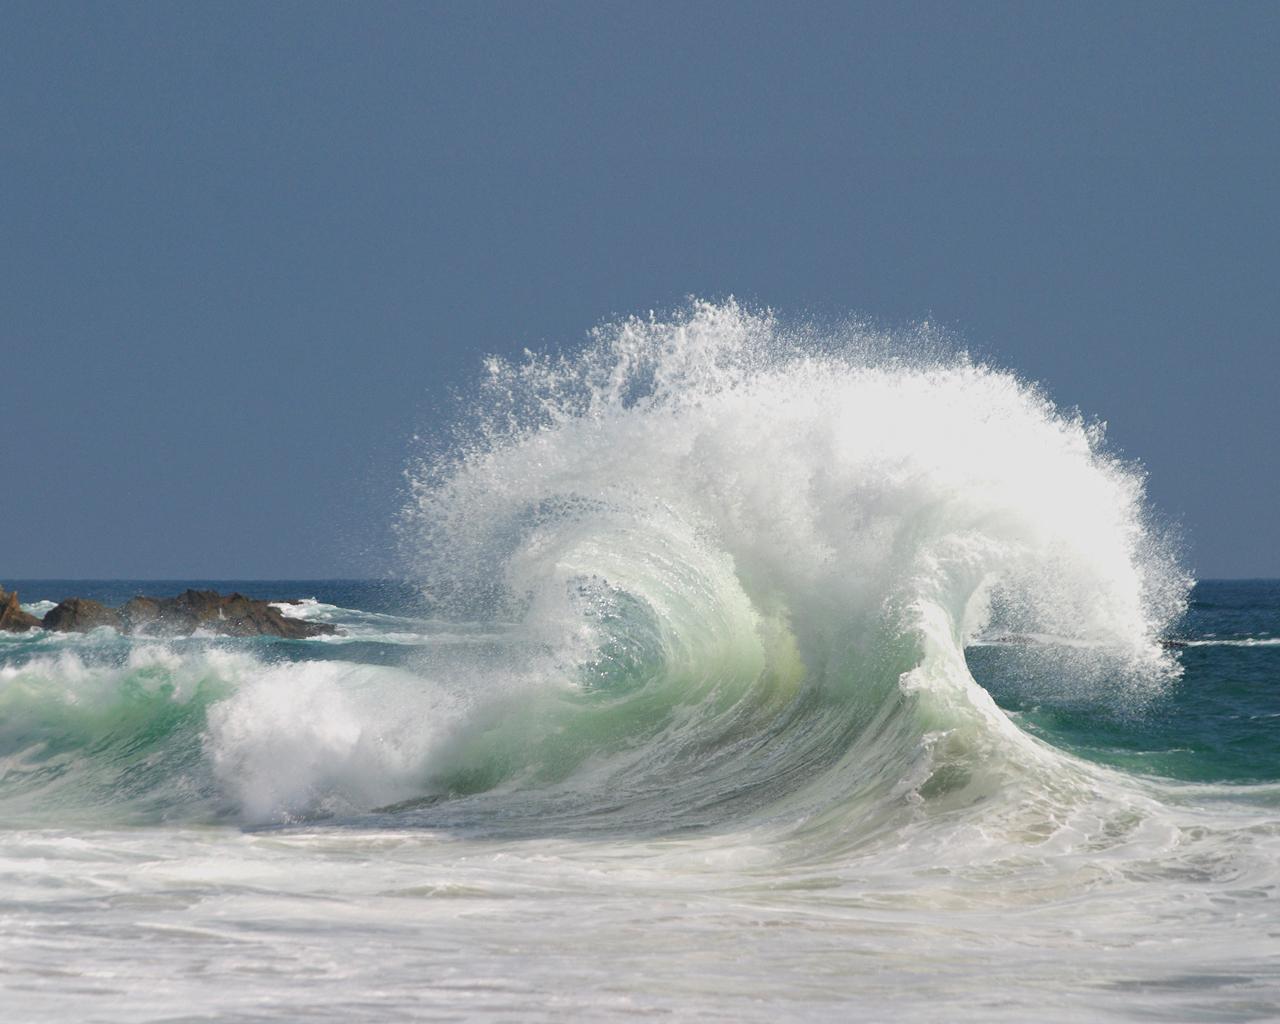 Water Ocean Wallpaper 1280x1024 Water Ocean Waves Splashes 1280x1024